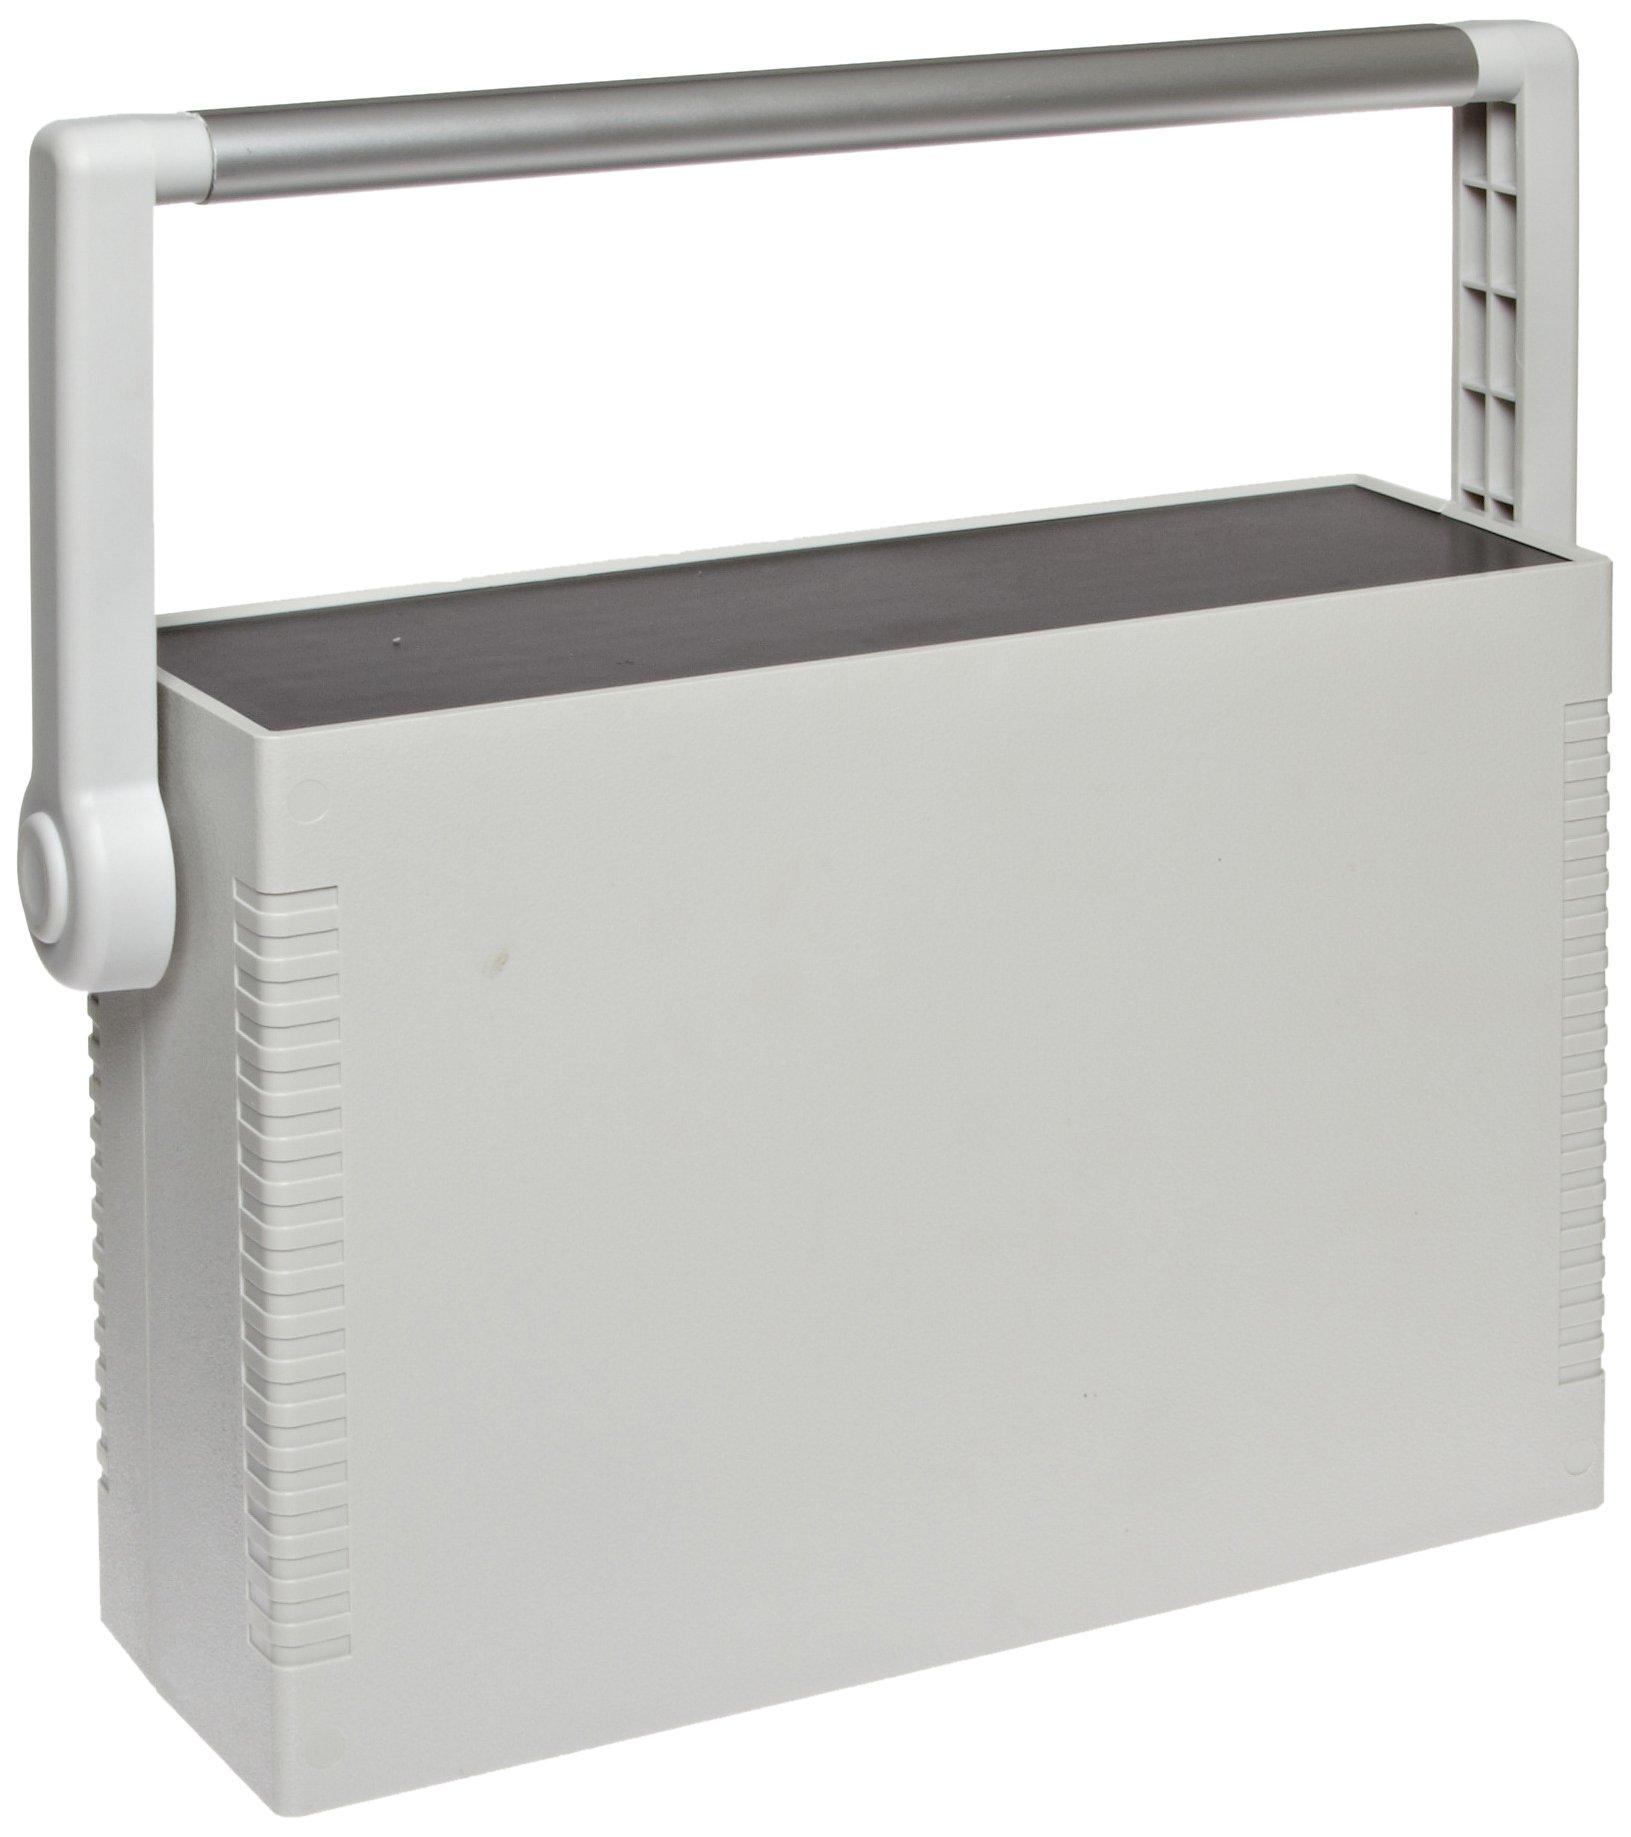 BUD Industries IP-6137 Plastic Instrument Case, 10-3/16'' Width x 3-11/32'' Height x 7-5/64'' Depth, Gray Finish